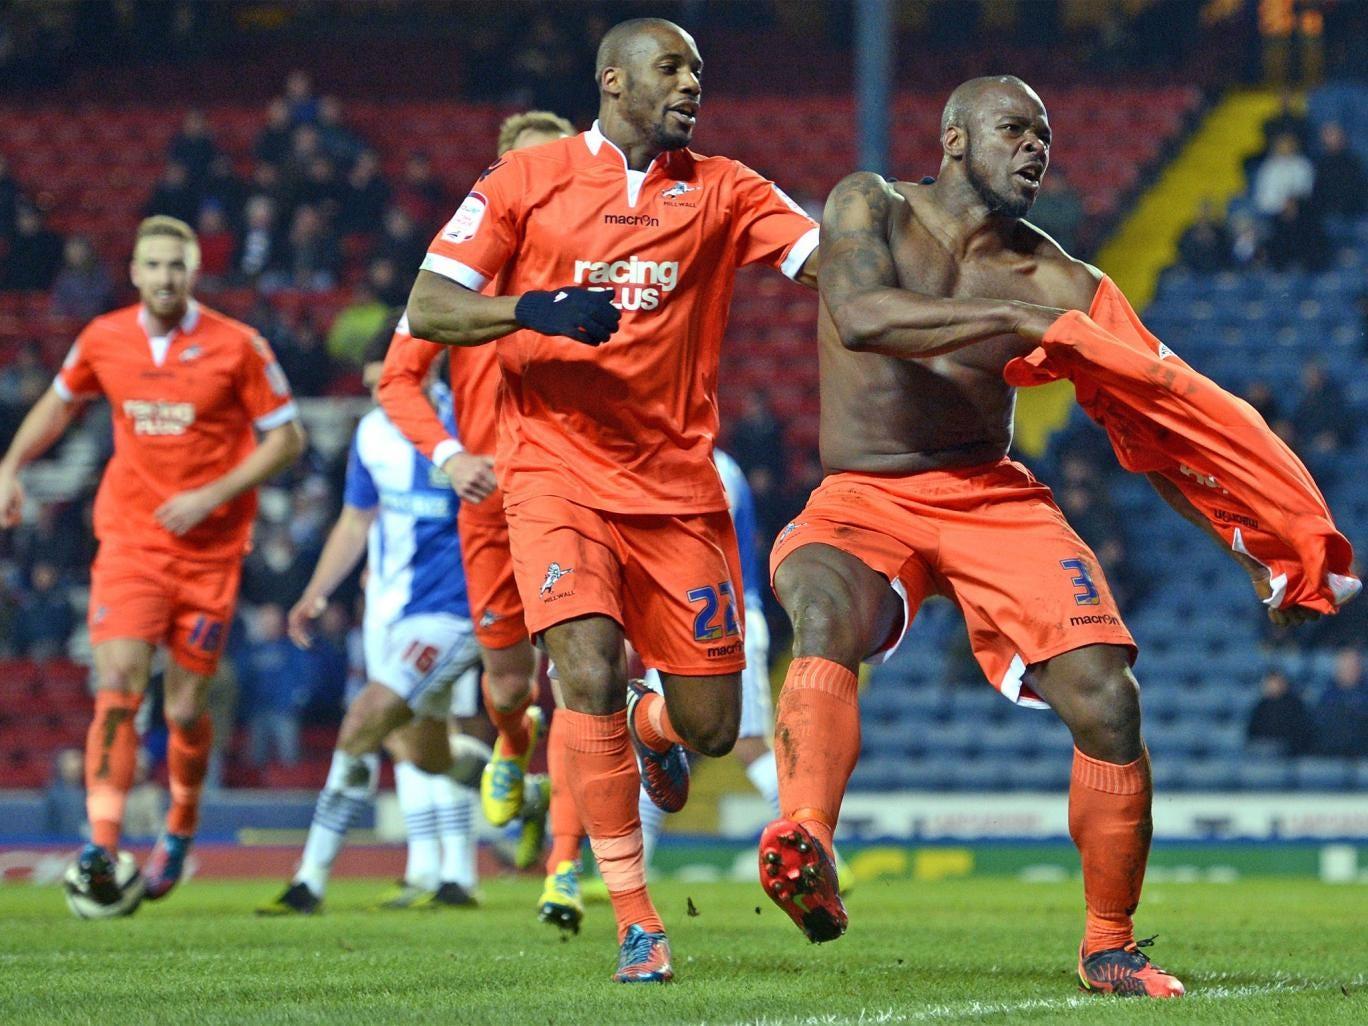 The Millwall captain, Danny Shittu, celebrates his winning goal